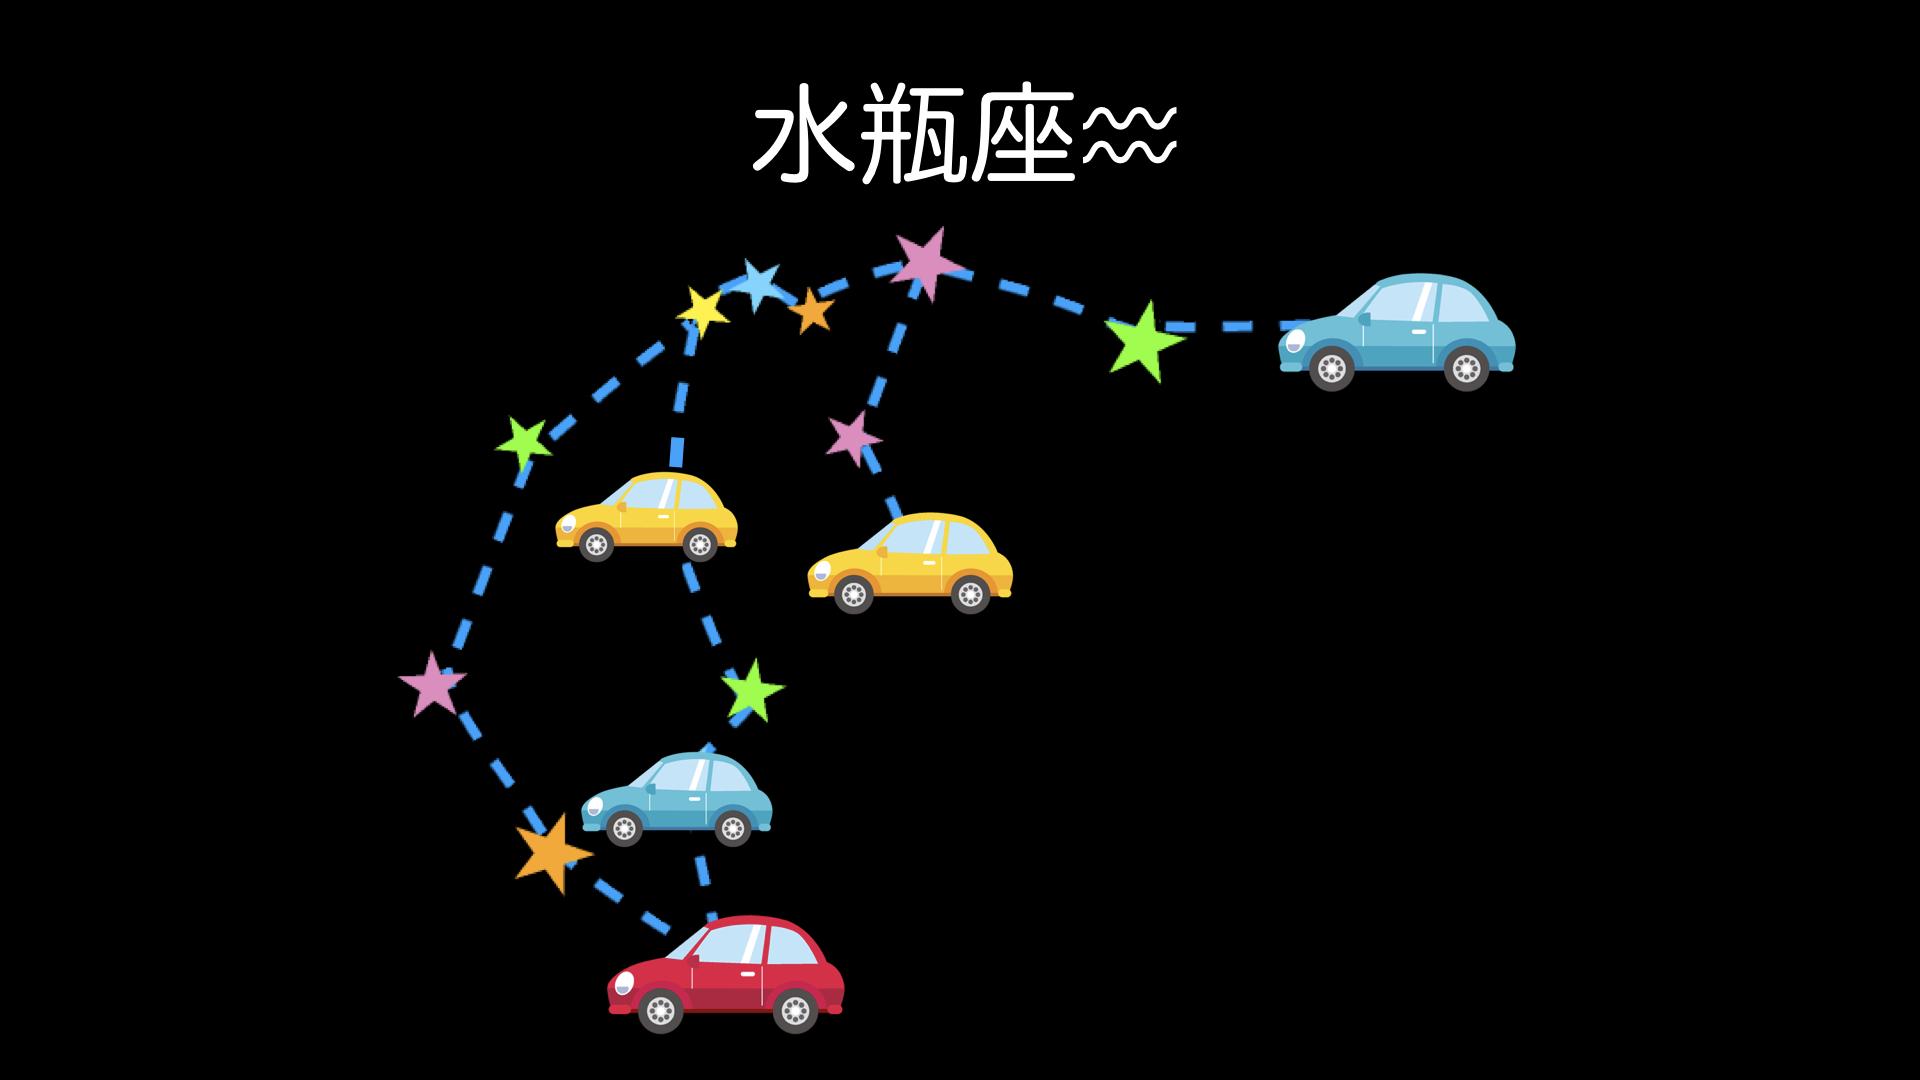 【CarMeで12星座占い】今週のあなたの運勢は?ー10月1日~10月7日